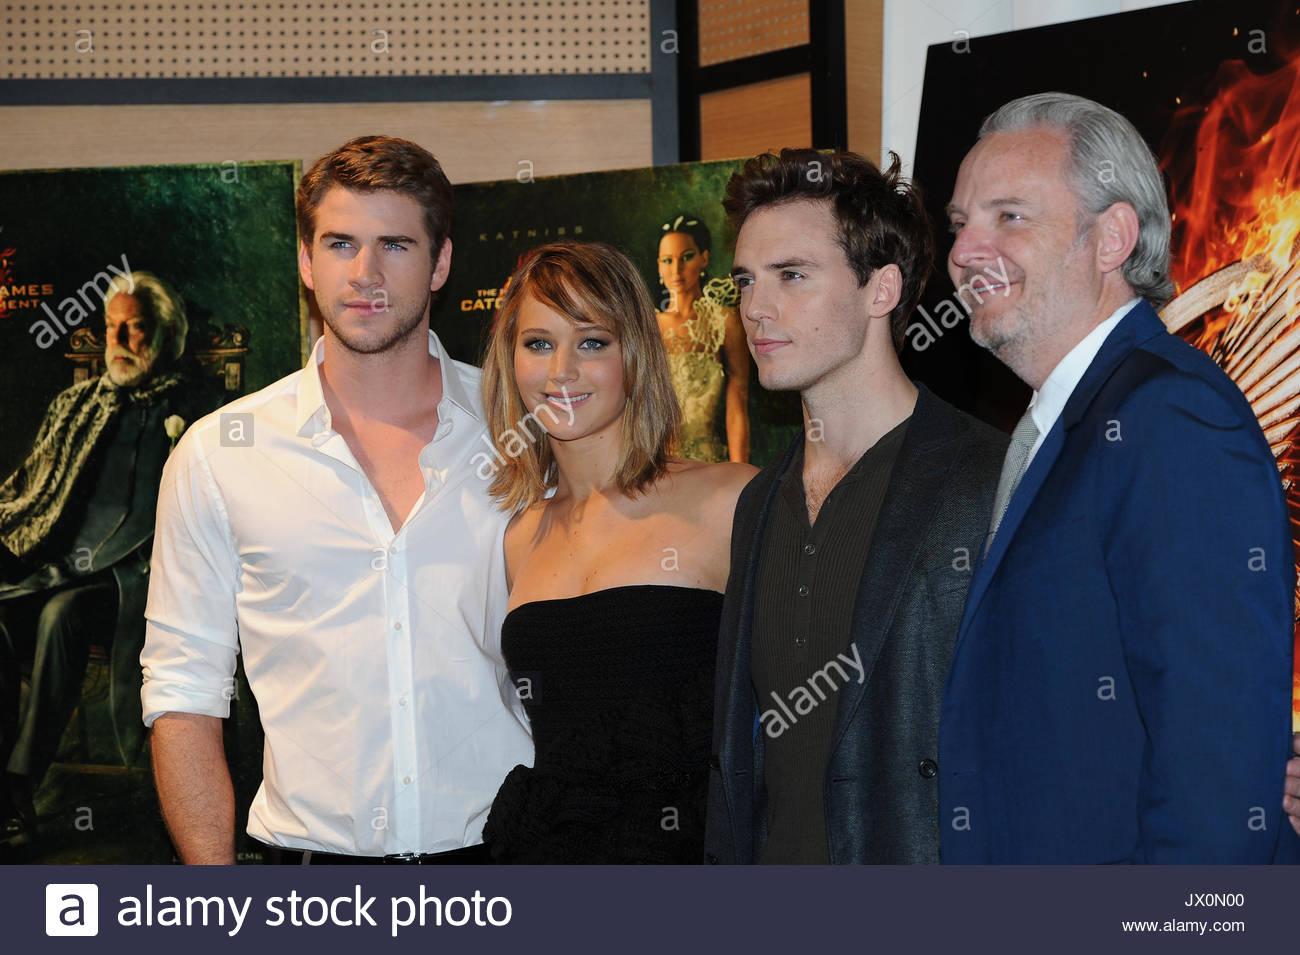 Liam Hemsworthjennifer Lawrencesam Claflin And Jon Kilik The Cast